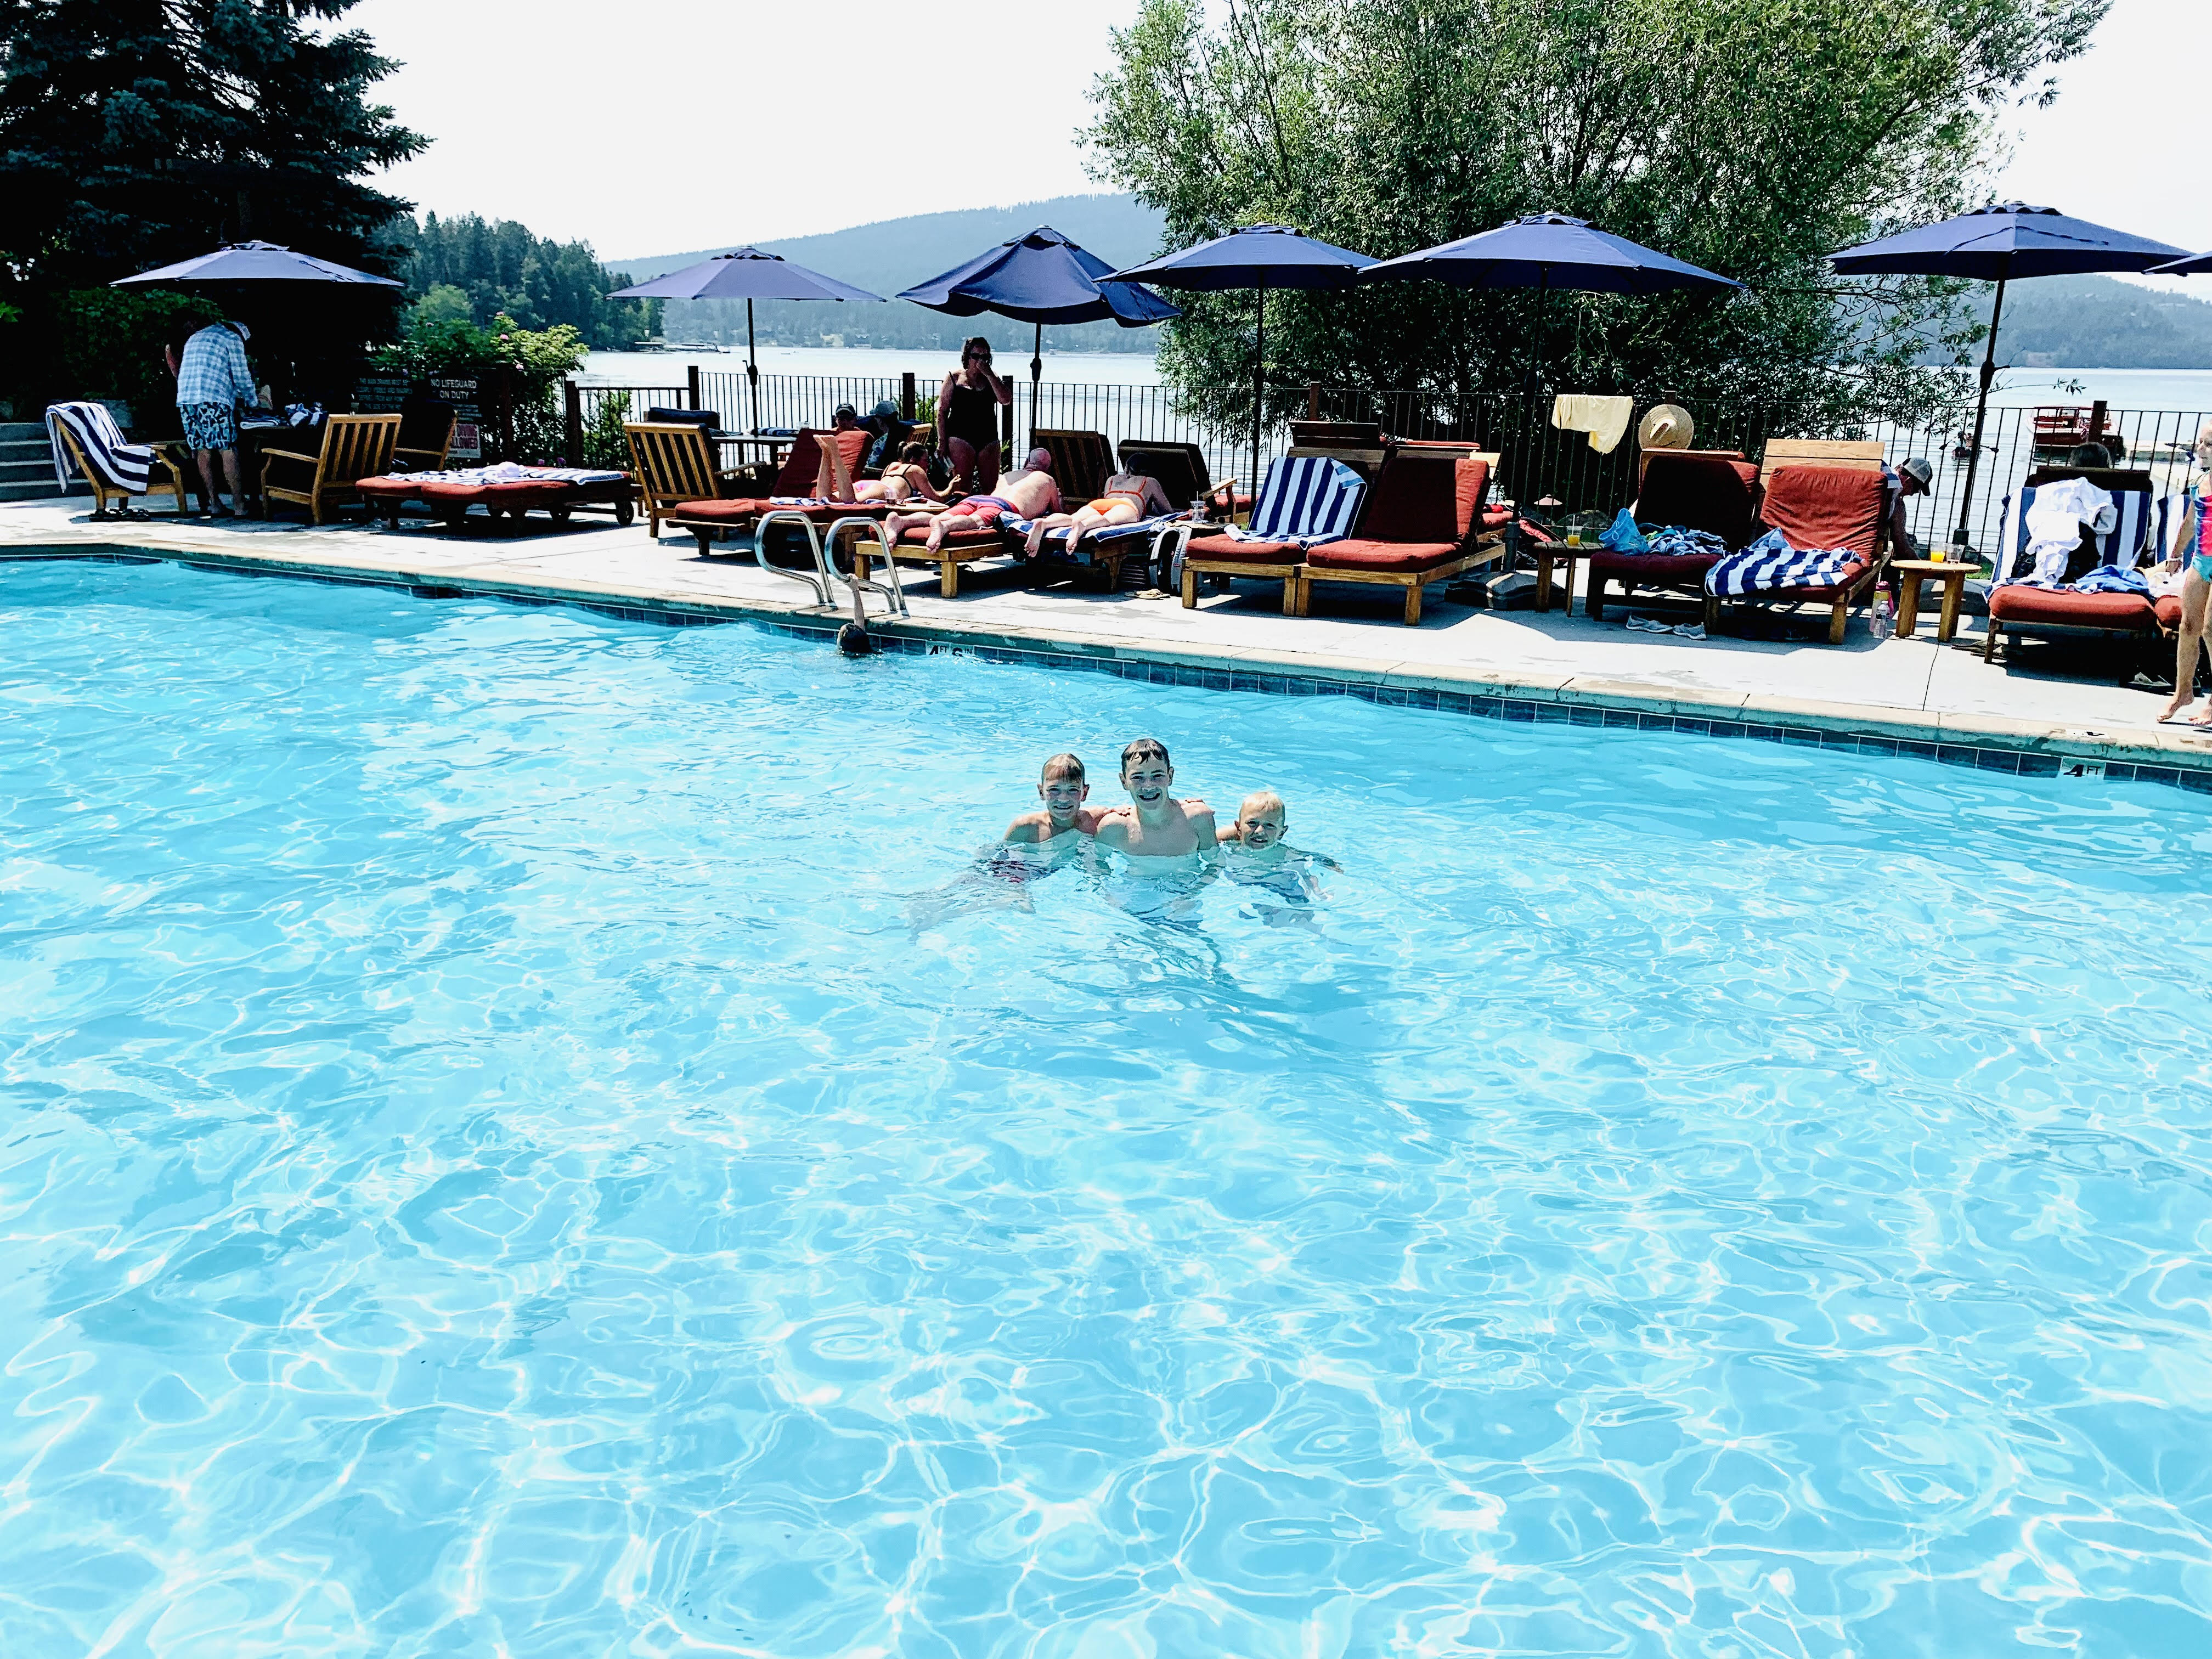 Pool at The Lodge at Whitefish Lake